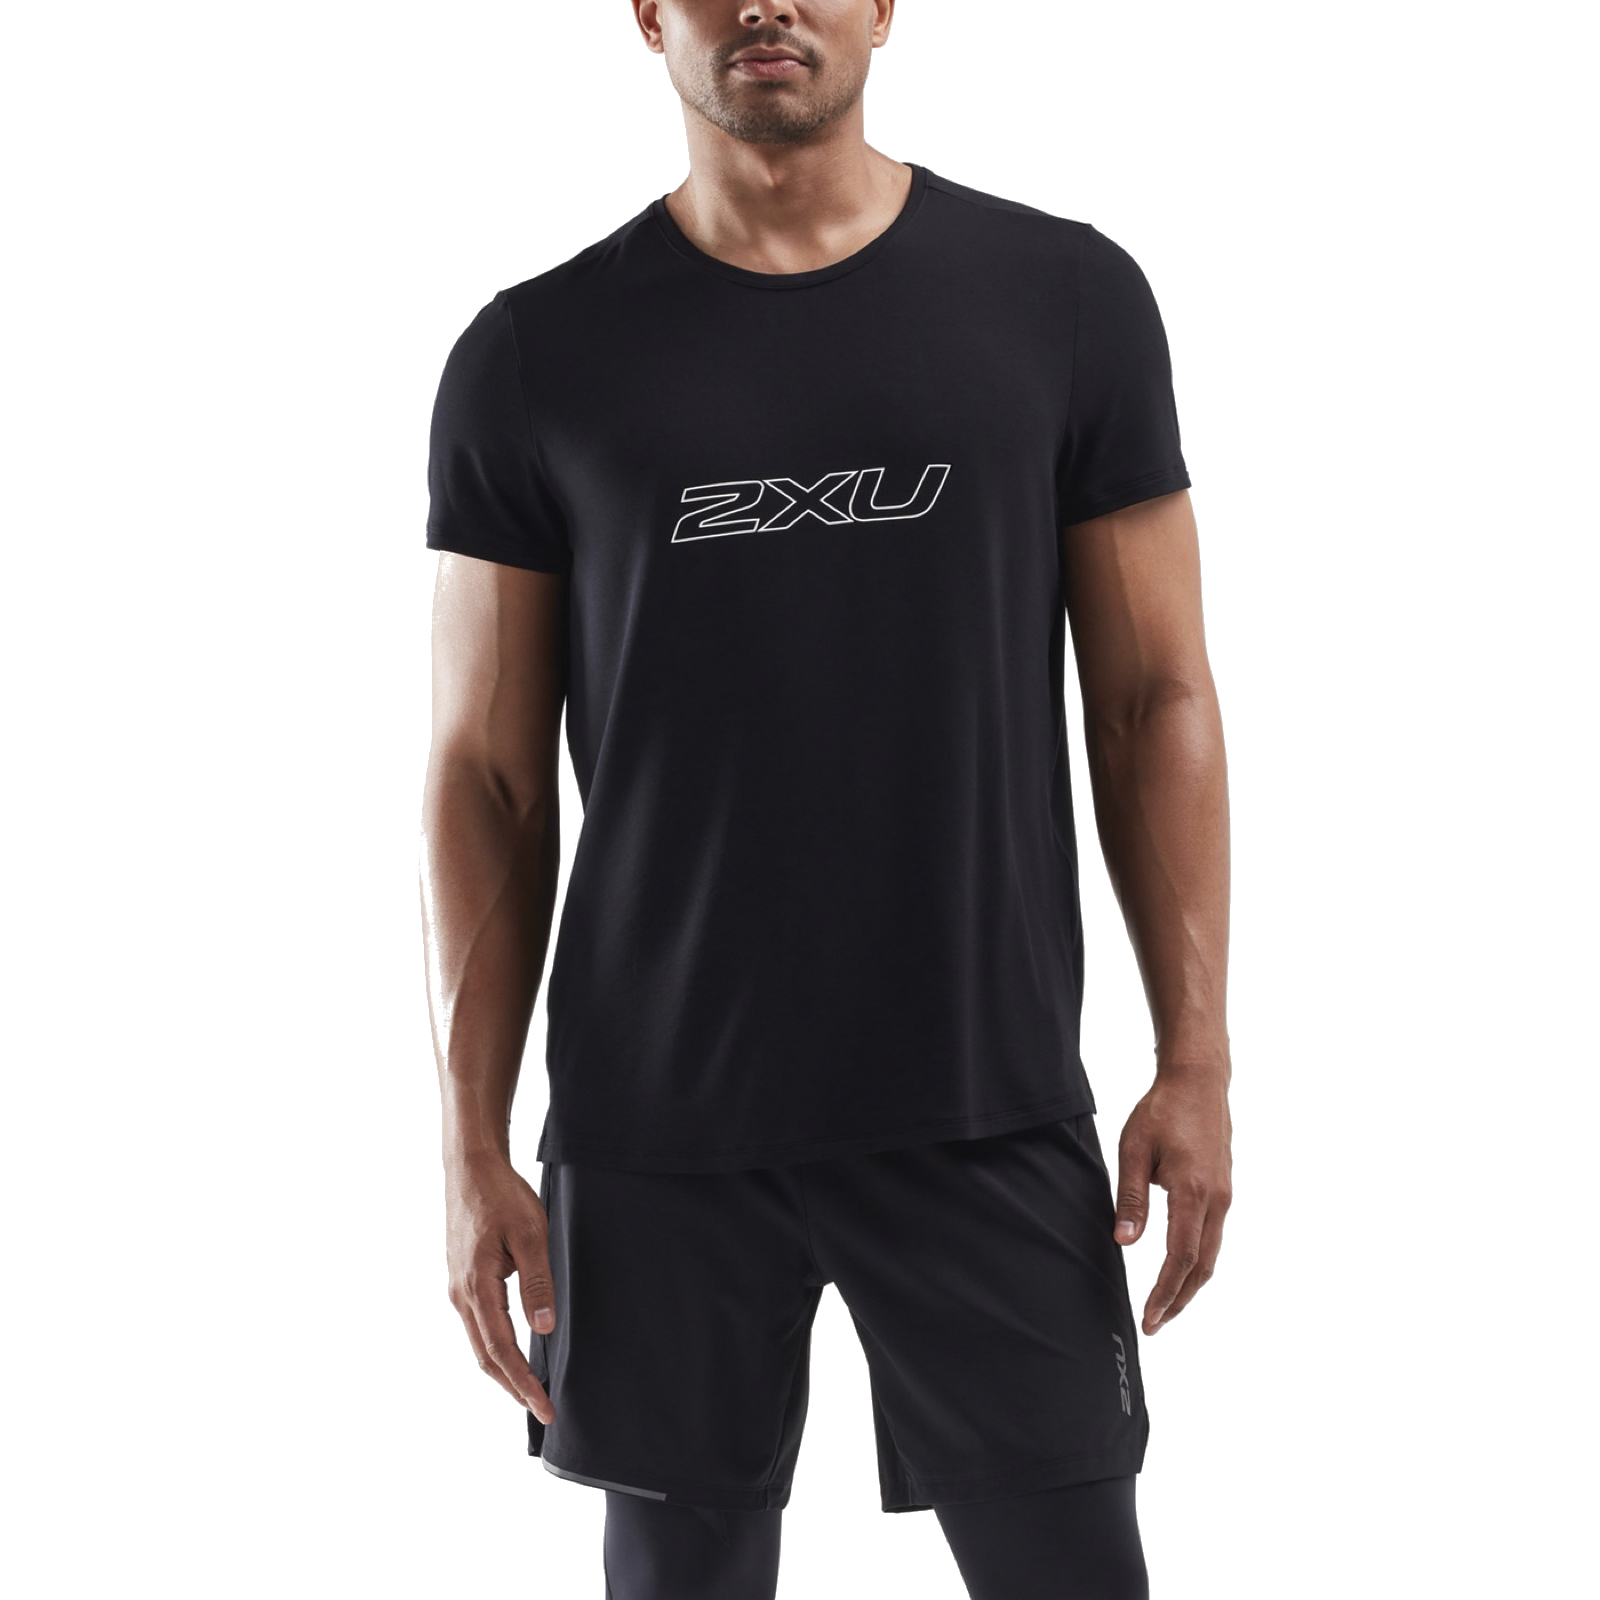 Imagen de 2XU Contender Camiseta - black/white